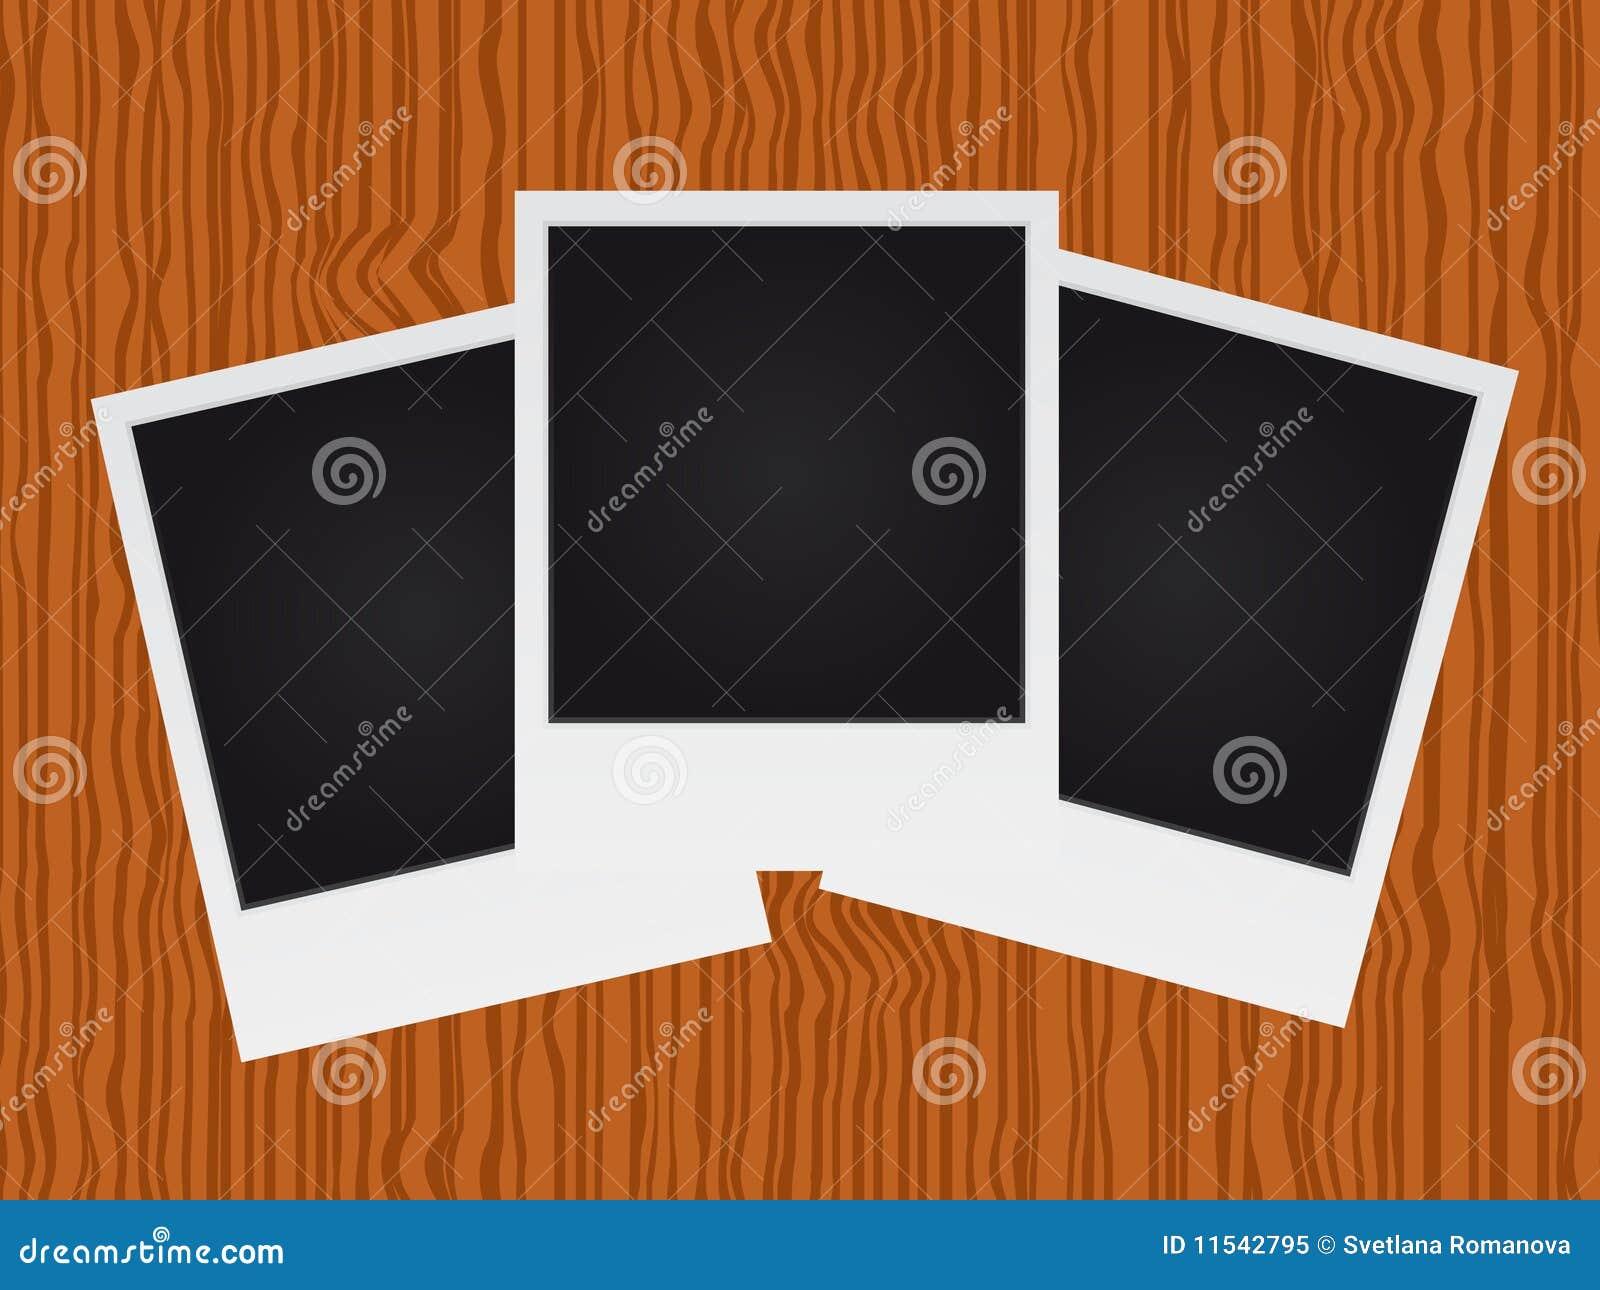 Set Of Polaroid On Wood Texture Royalty Free Stock Photo - Image: 11542795